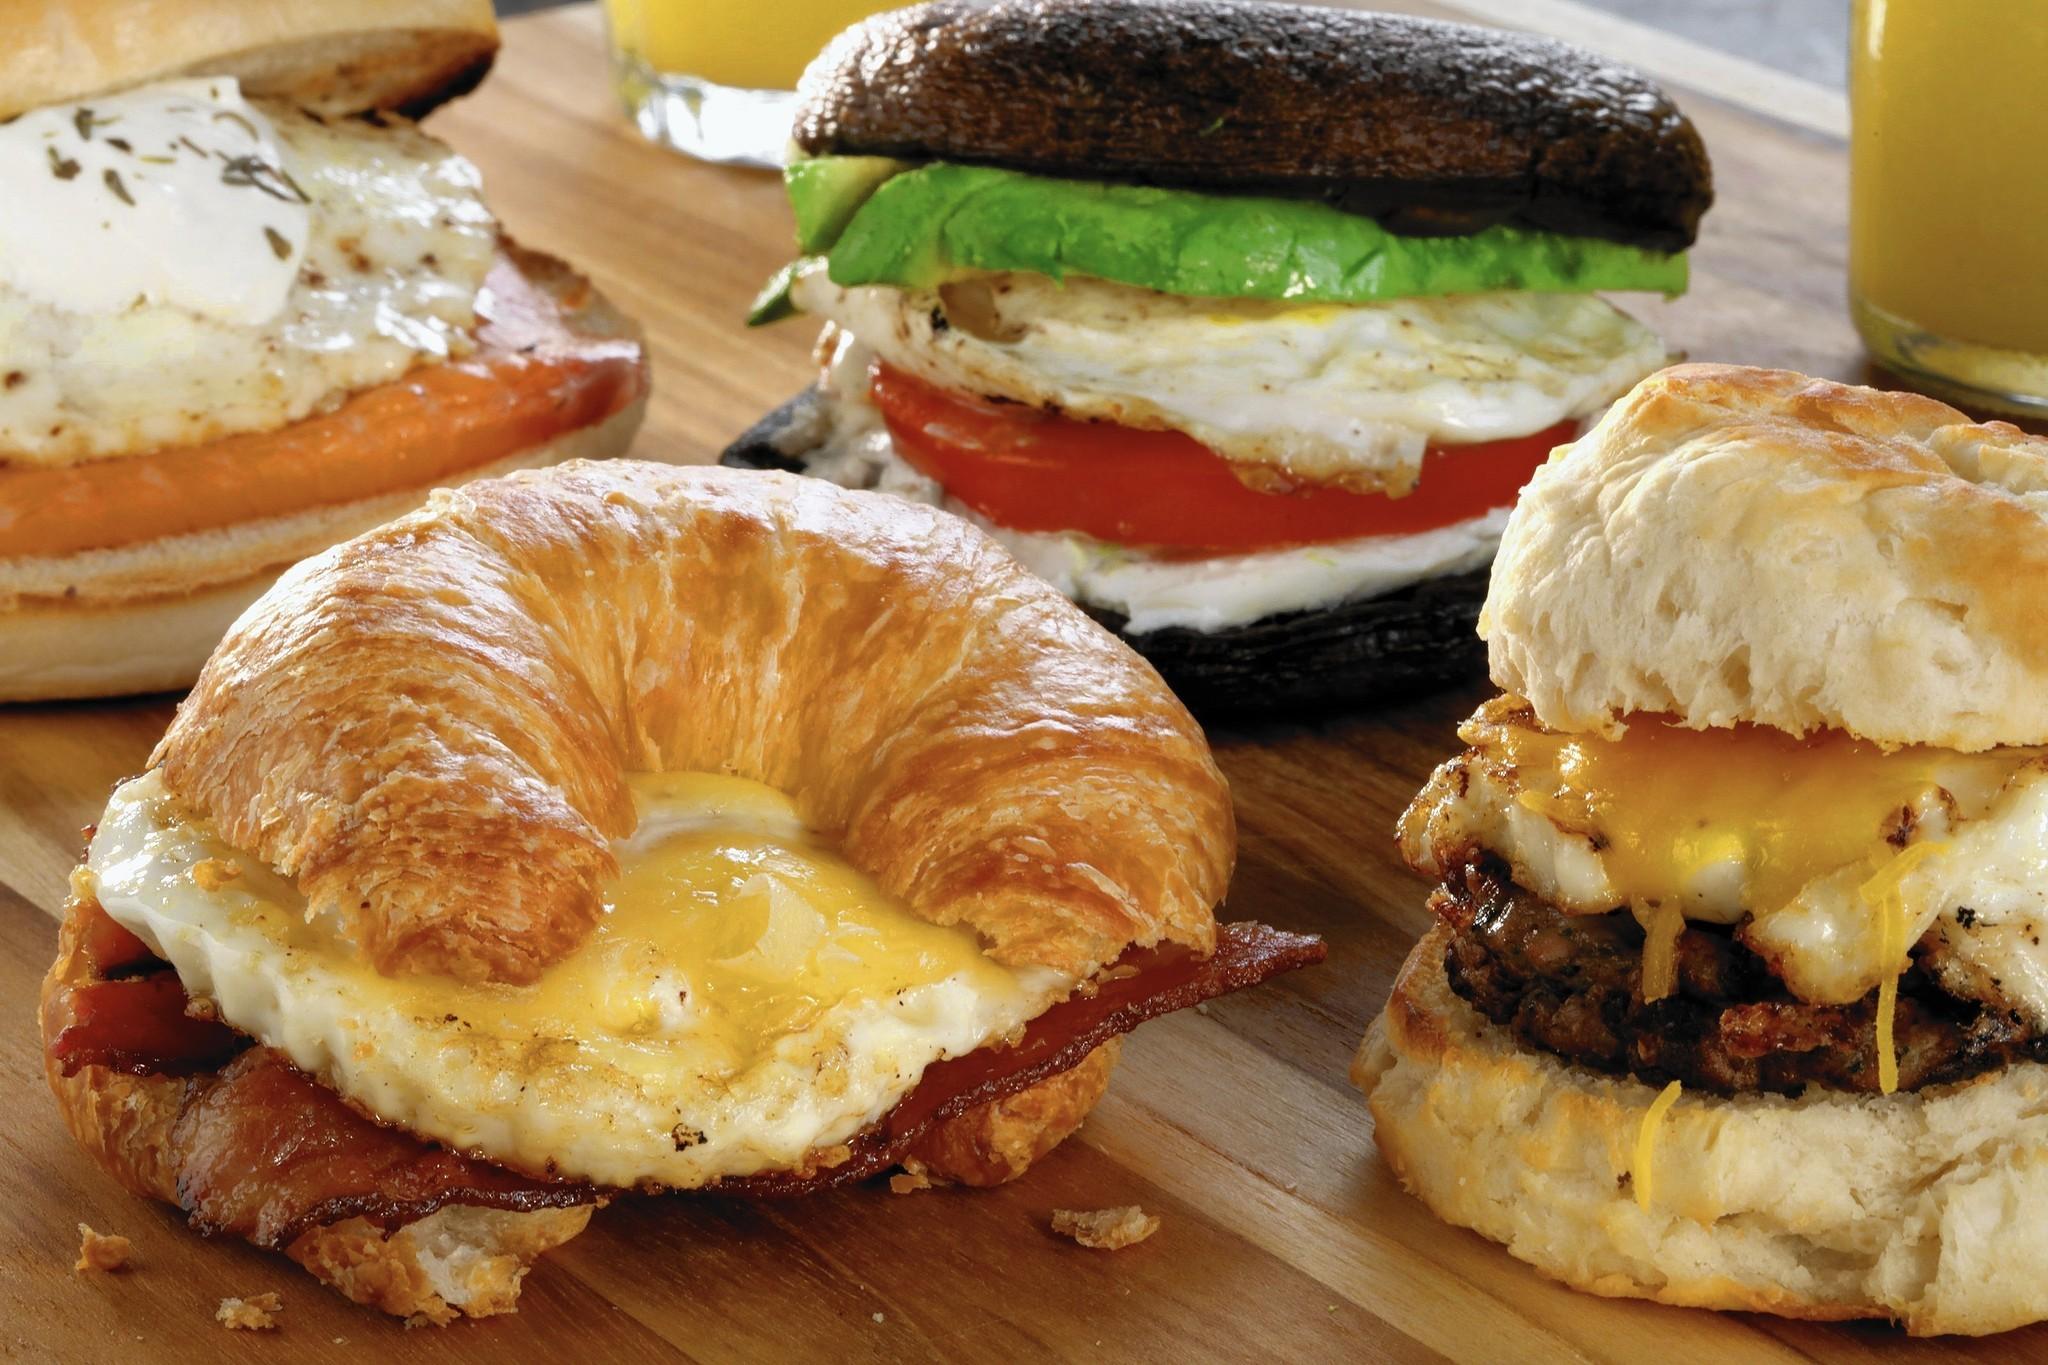 sc-breakfast-sandwiches-prep-food-0212-20160209.jpg